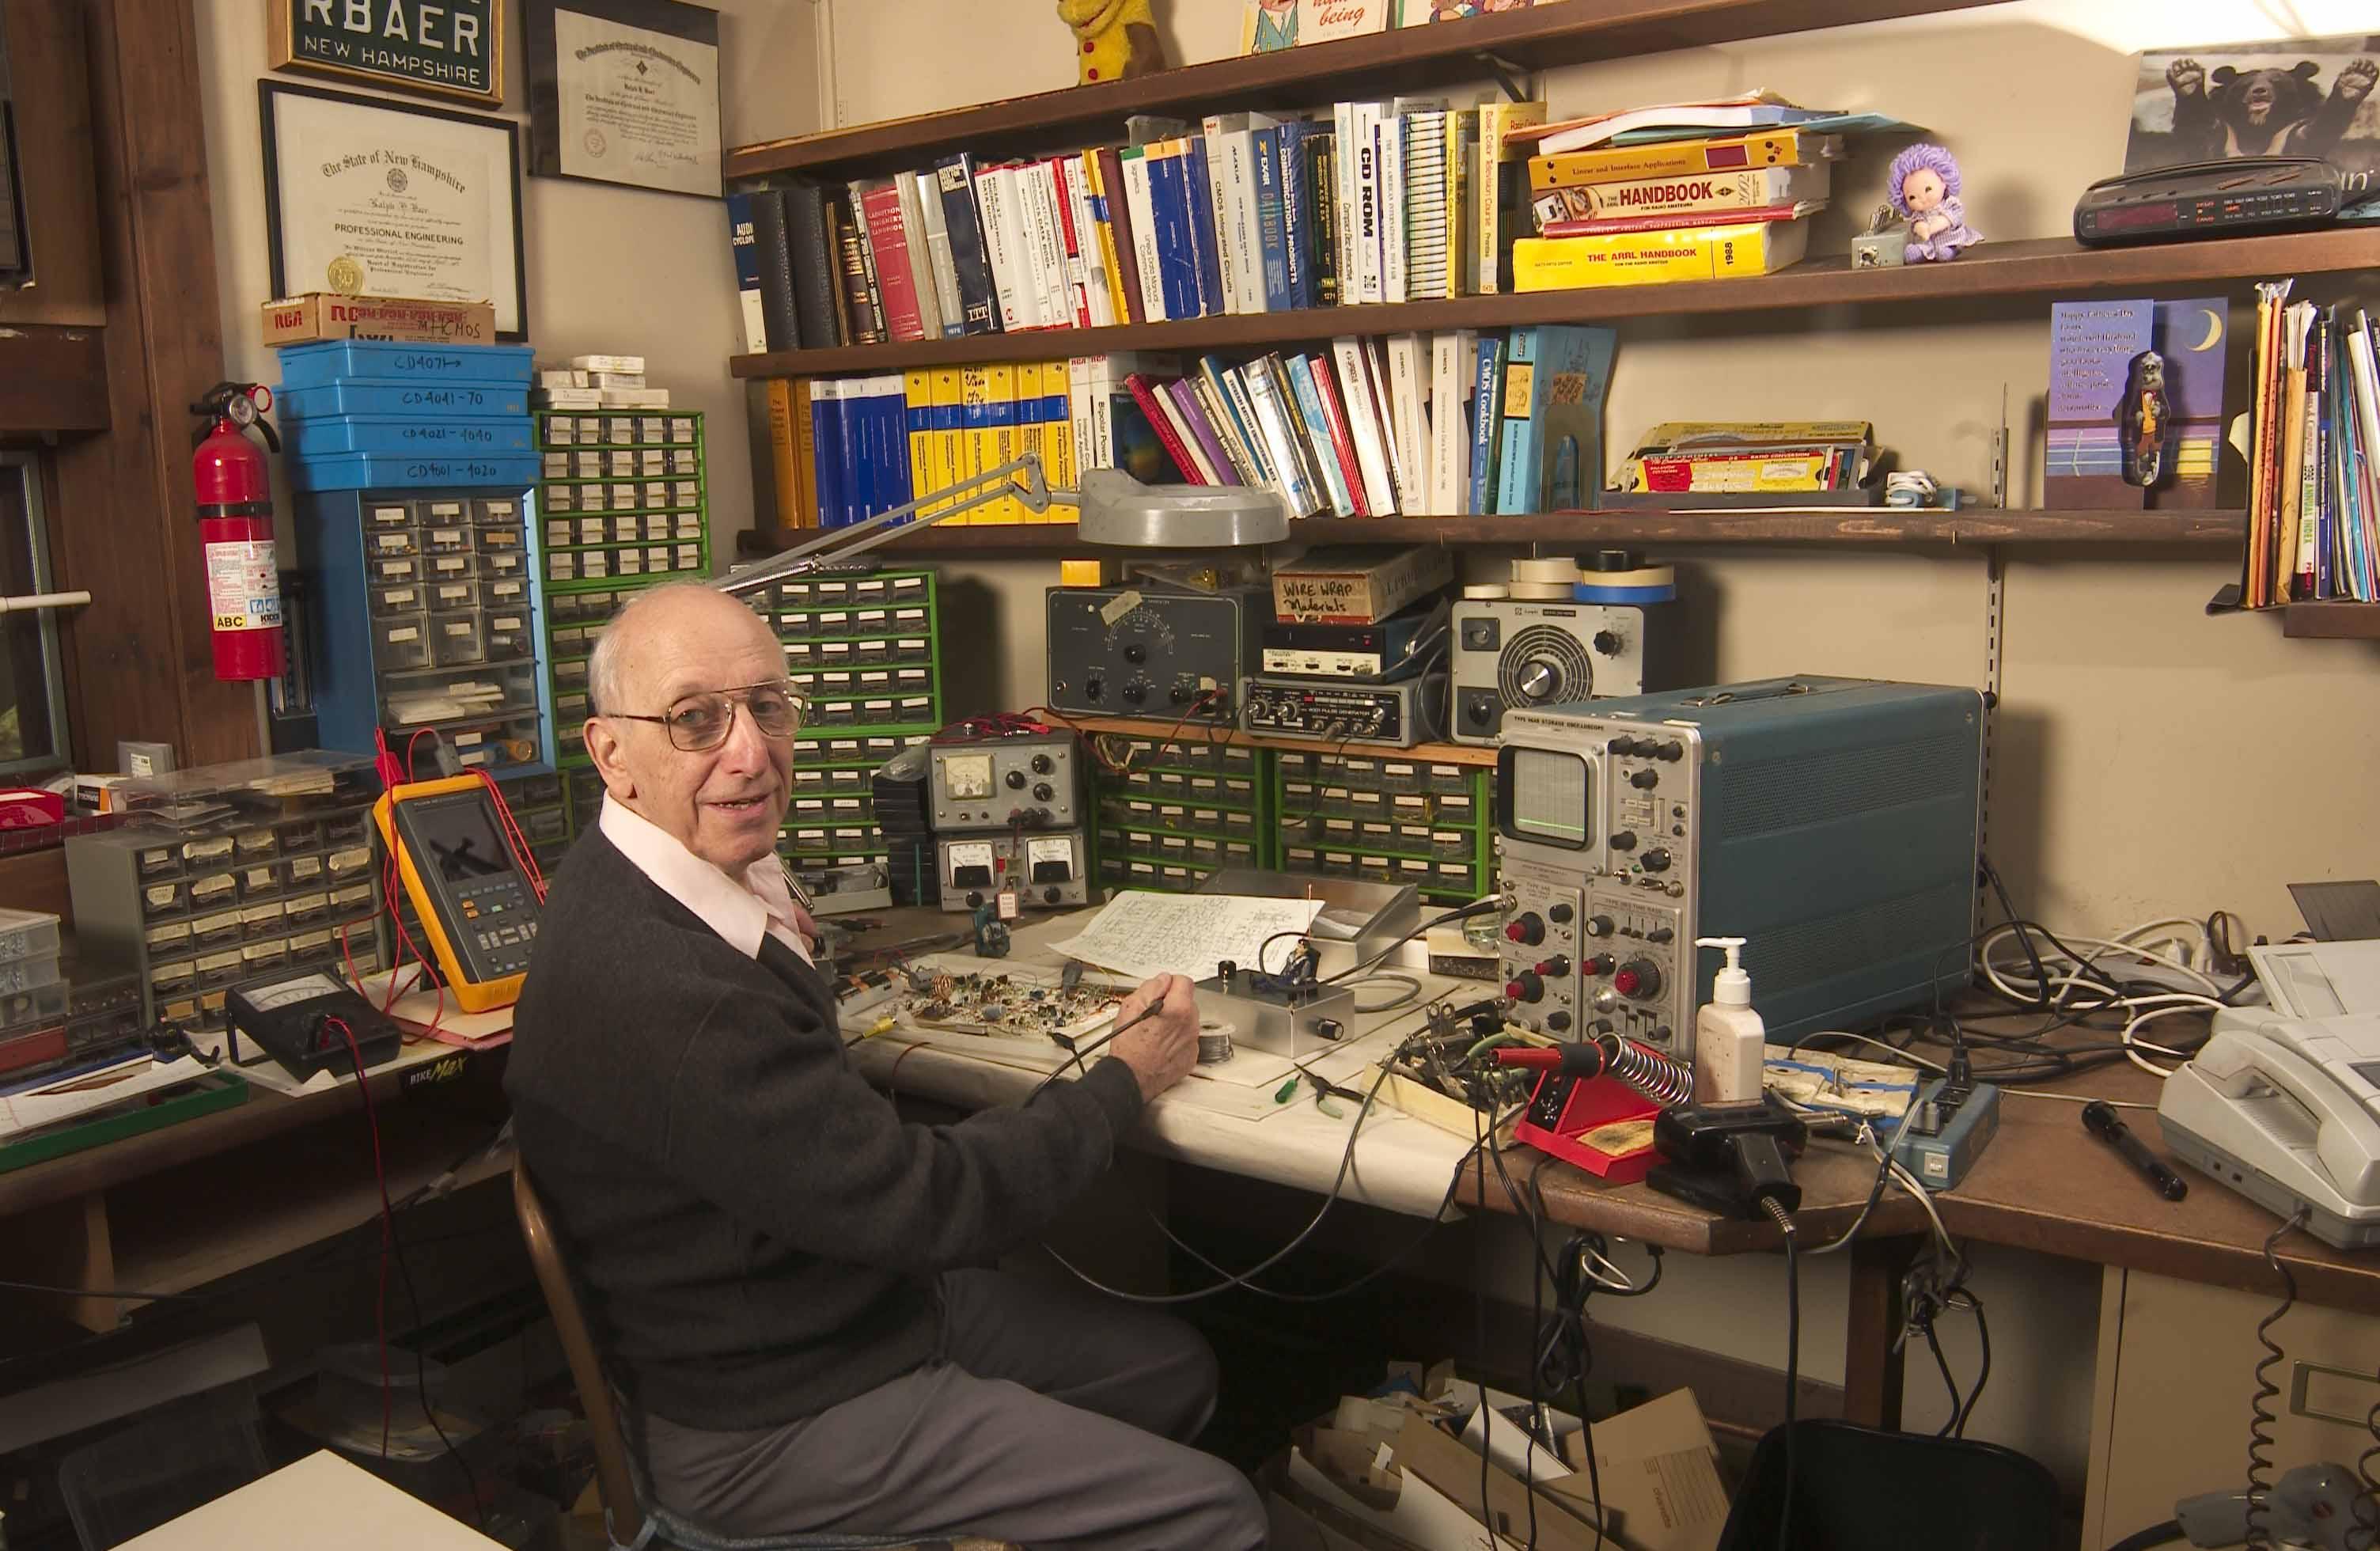 Ralph Baer in his workshop